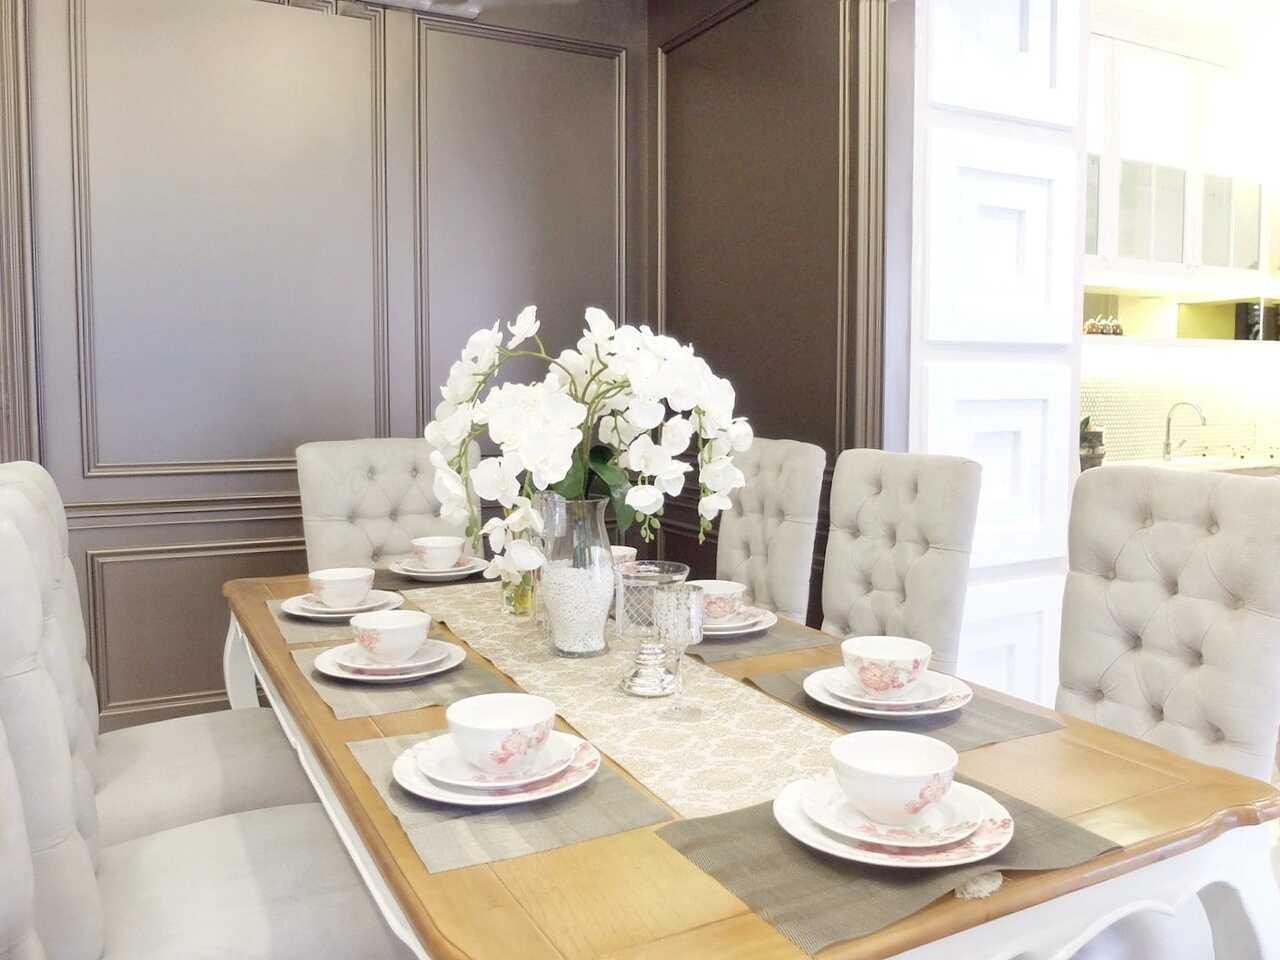 7Design Architect Mrs. D House Citrasun, Yogjakarta Citrasun, Yogjakarta Diningroom Klasik 18700